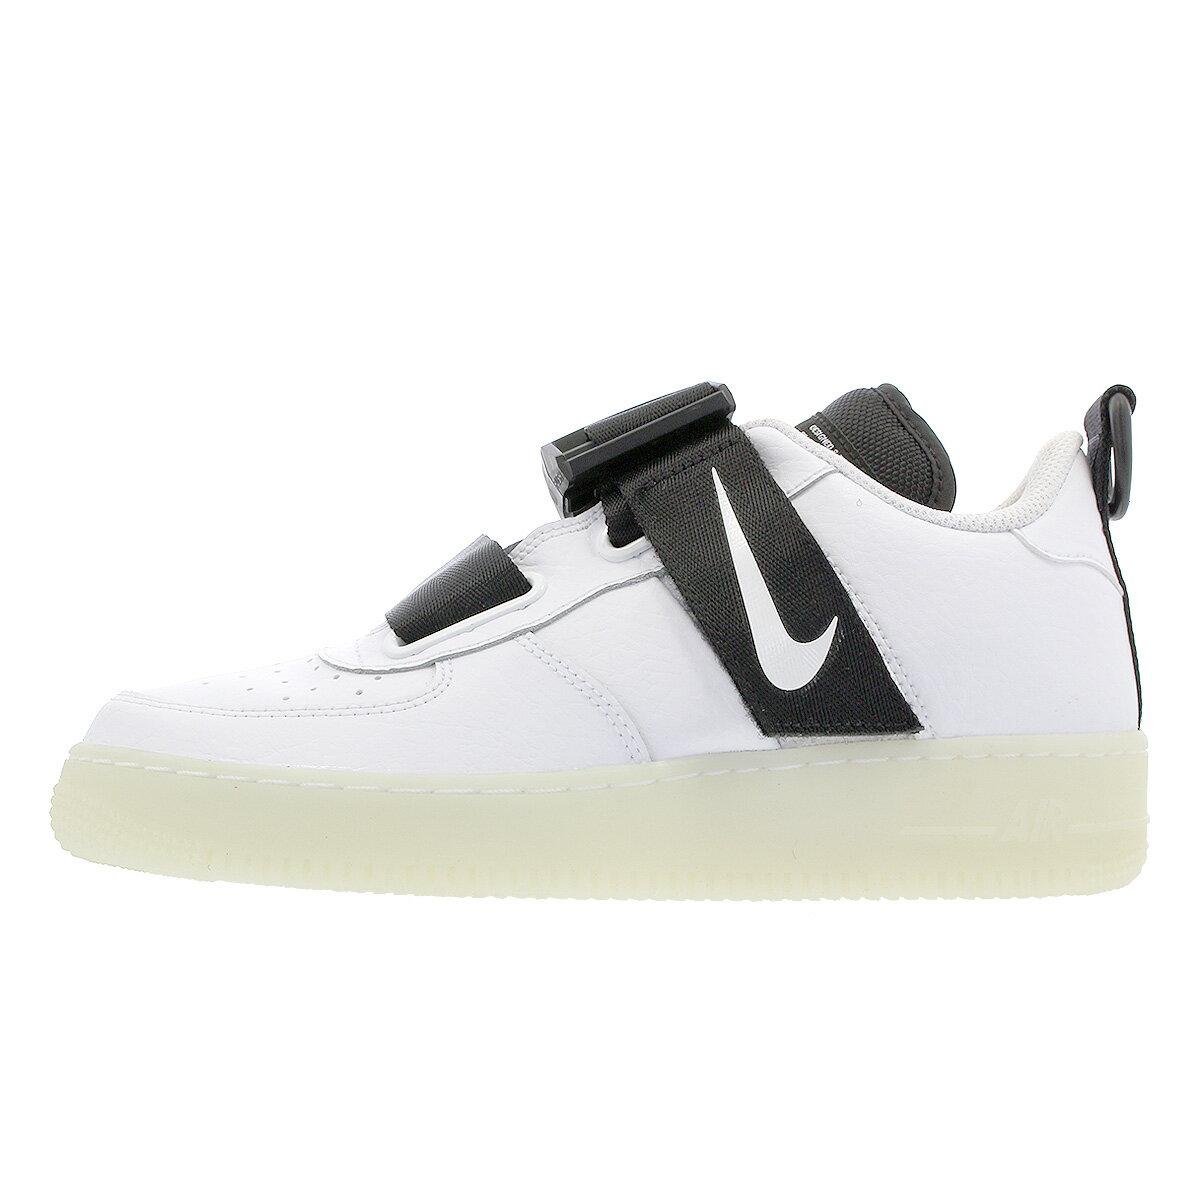 Nike AIR FORCE 1 UTILITY QS shoes white